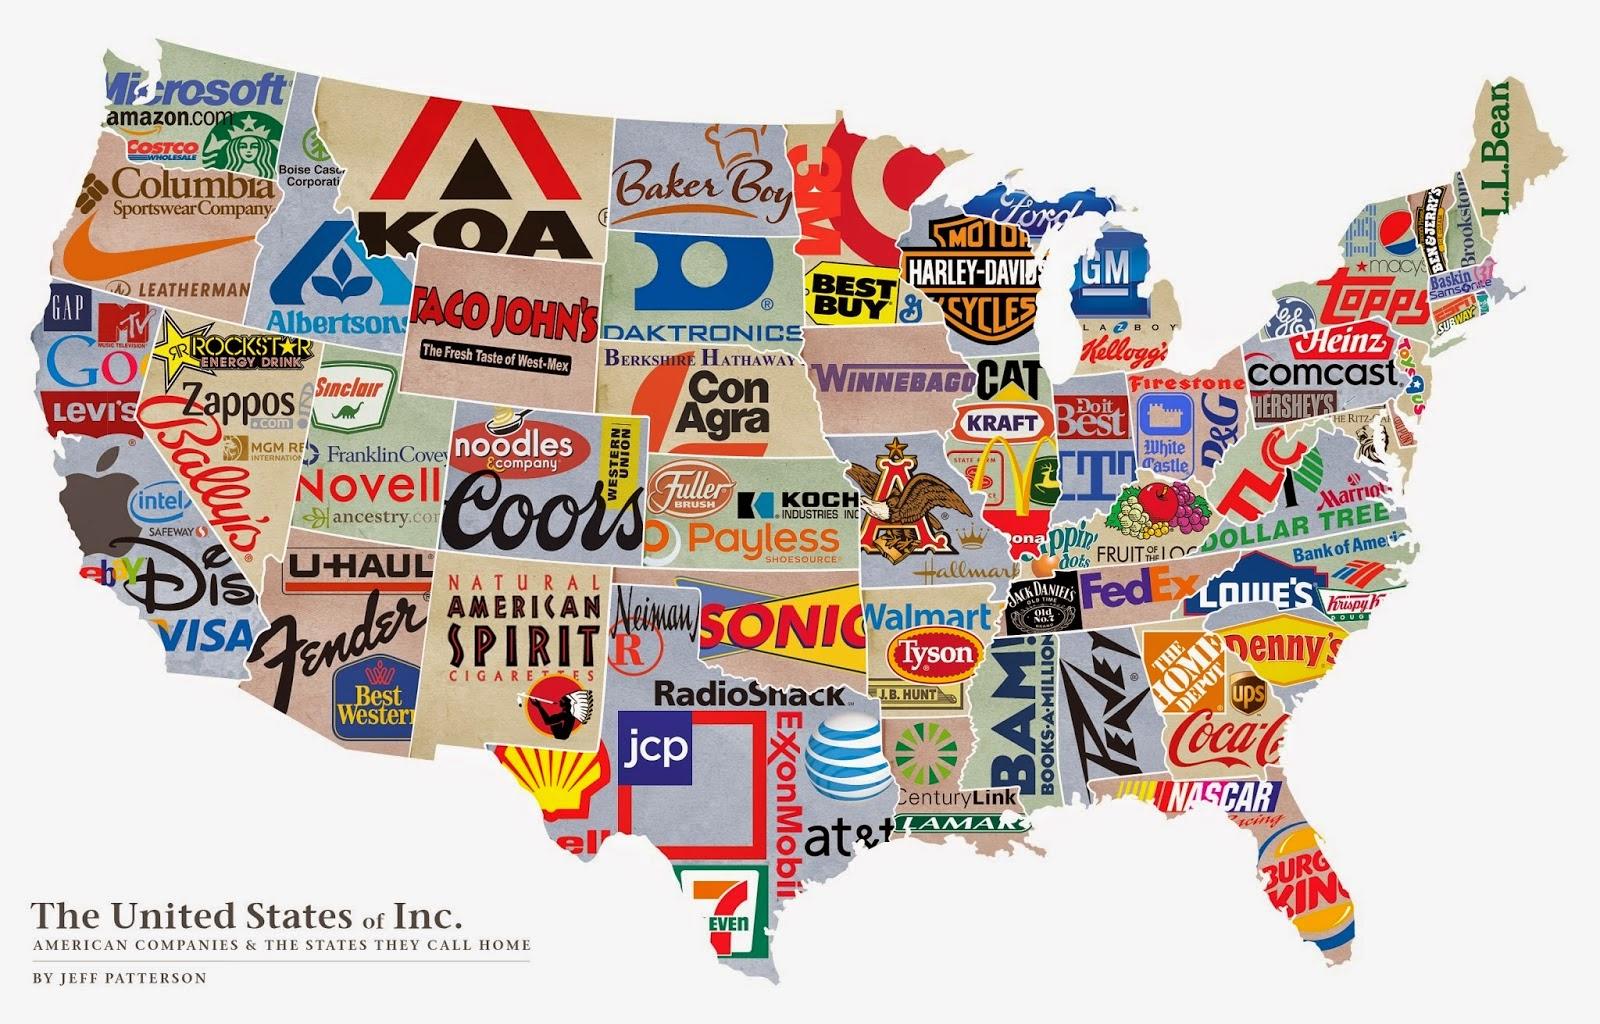 https://eclinik.files.wordpress.com/2014/12/d5e00-012bunited-states-of-inc-large.jpg